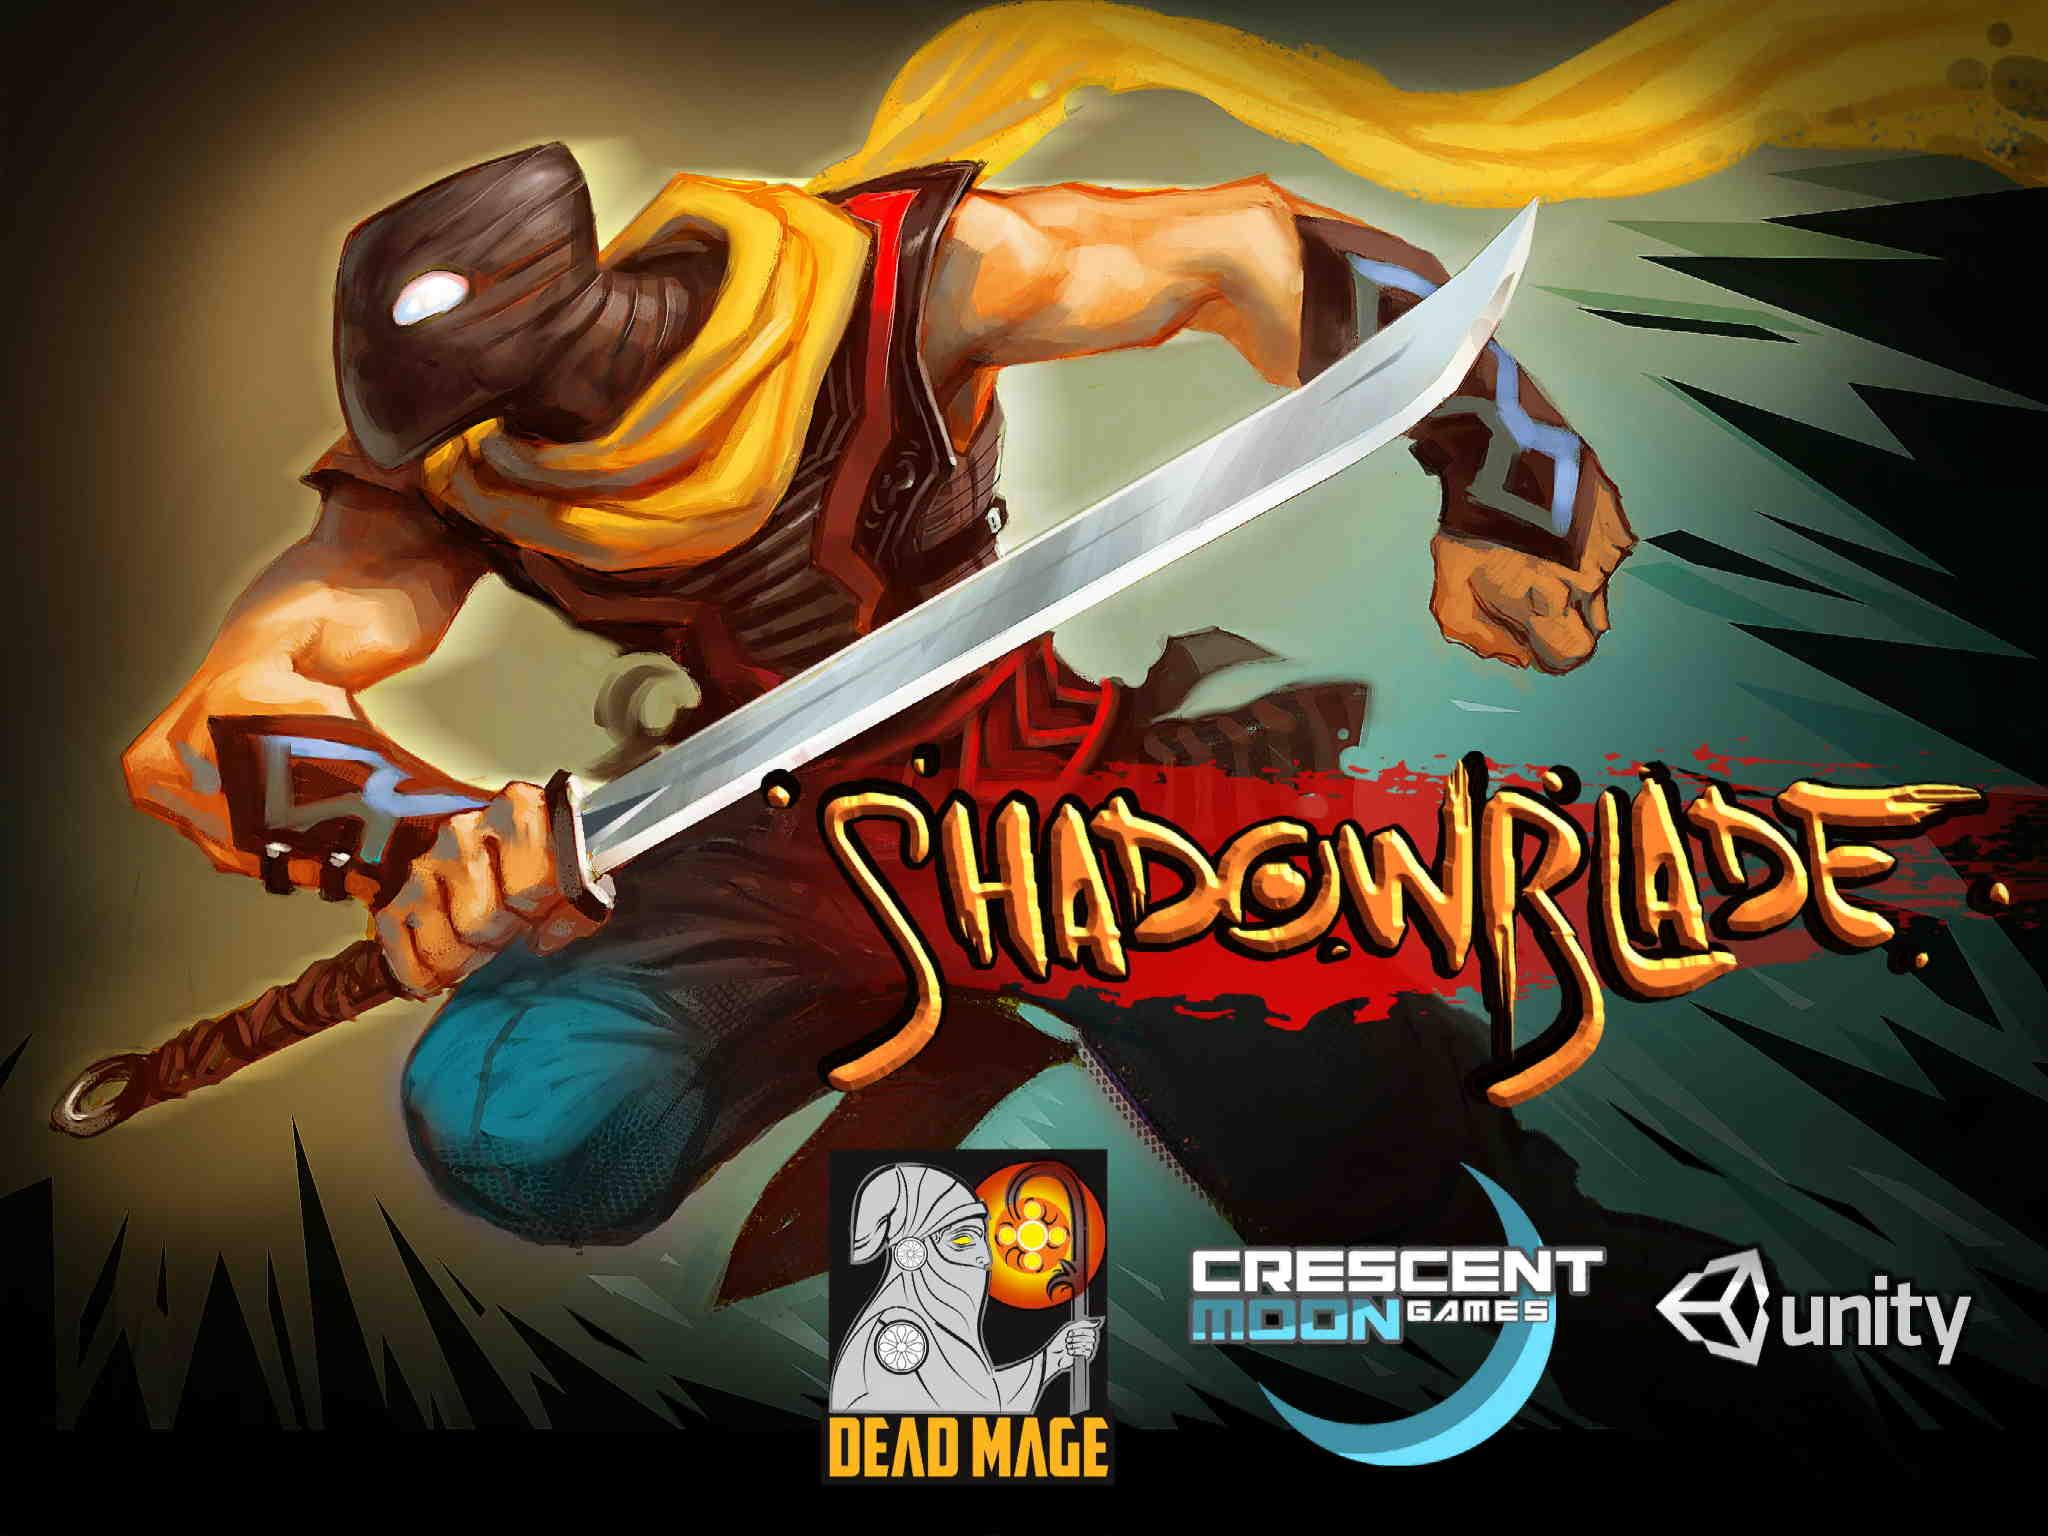 Shadowblade_01